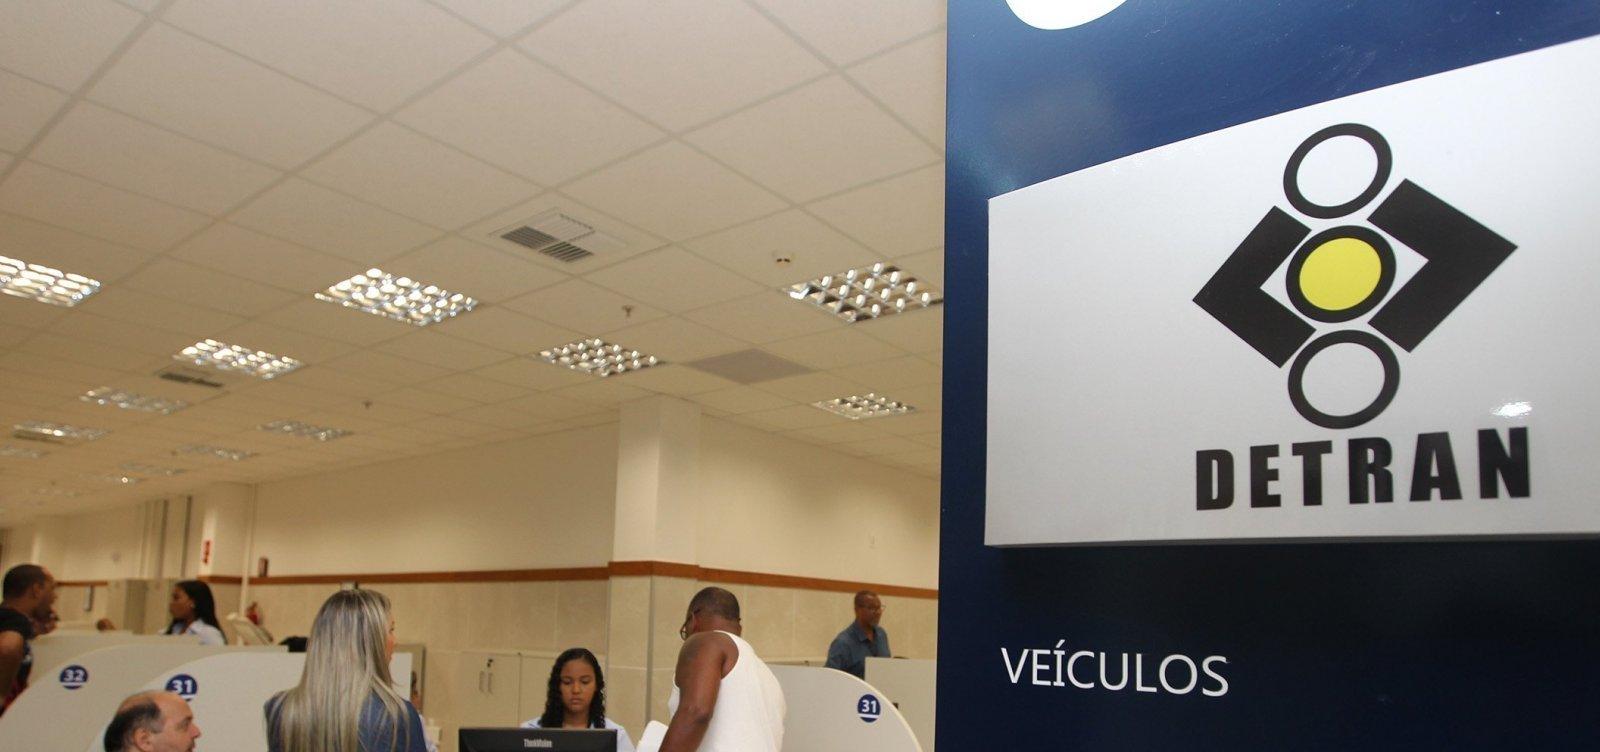 Dentran-BA anuncia uso de PIX para pagamentos de taxas e outros serviços